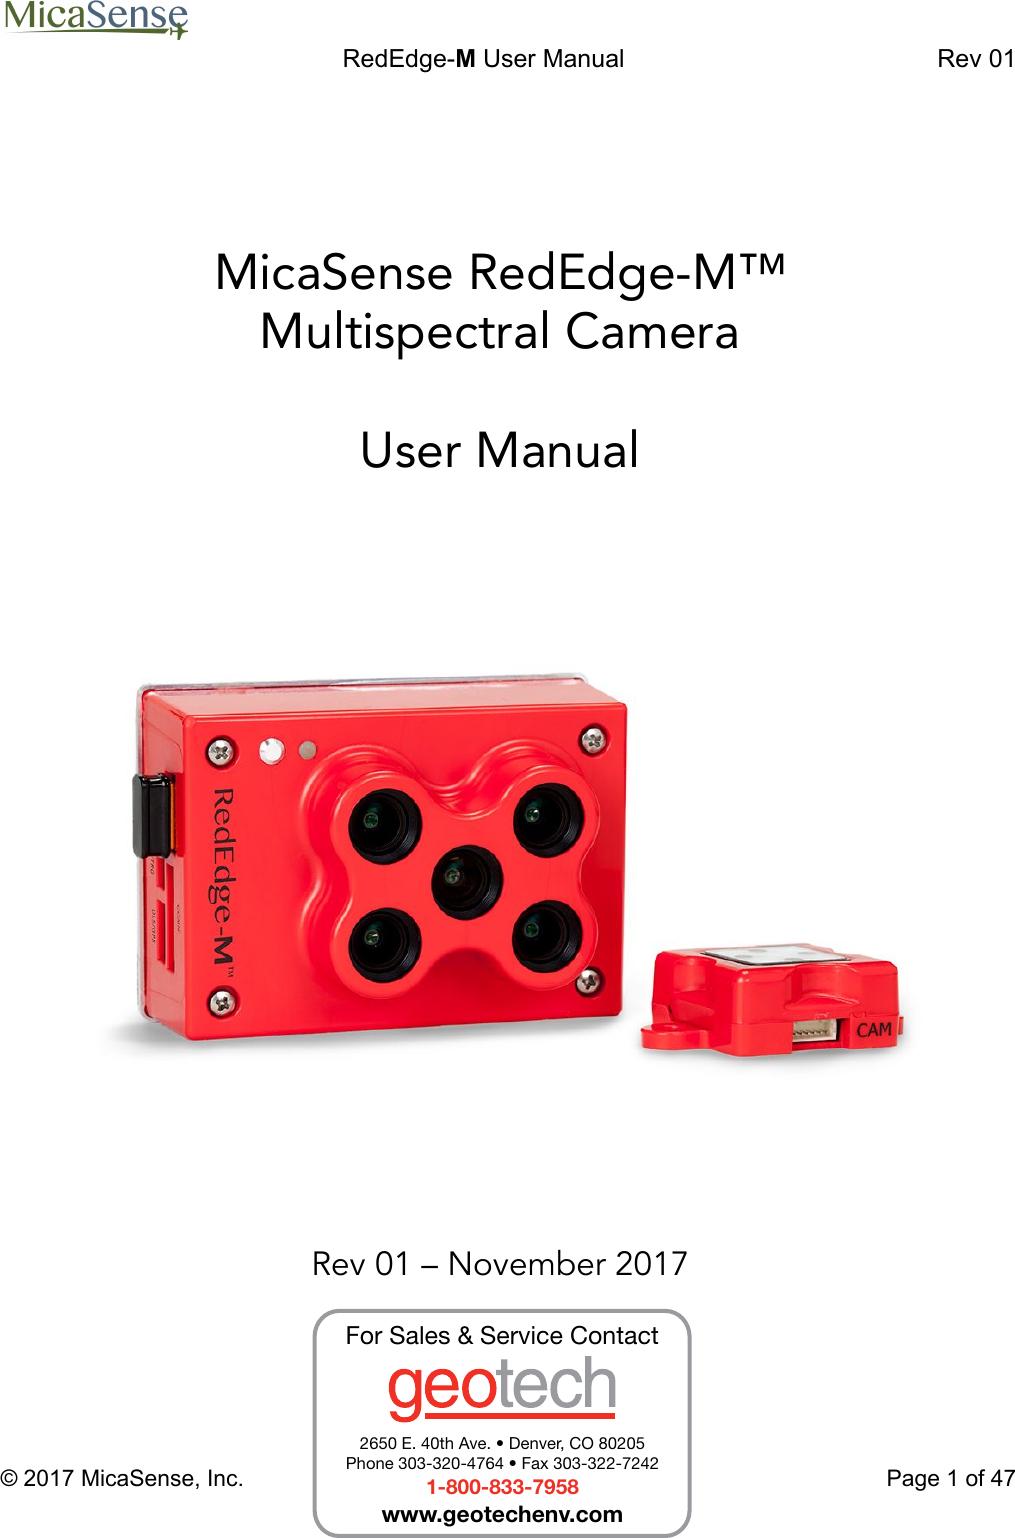 MicaSense RedEdge M Multispectral Camera User Manual Red Edge